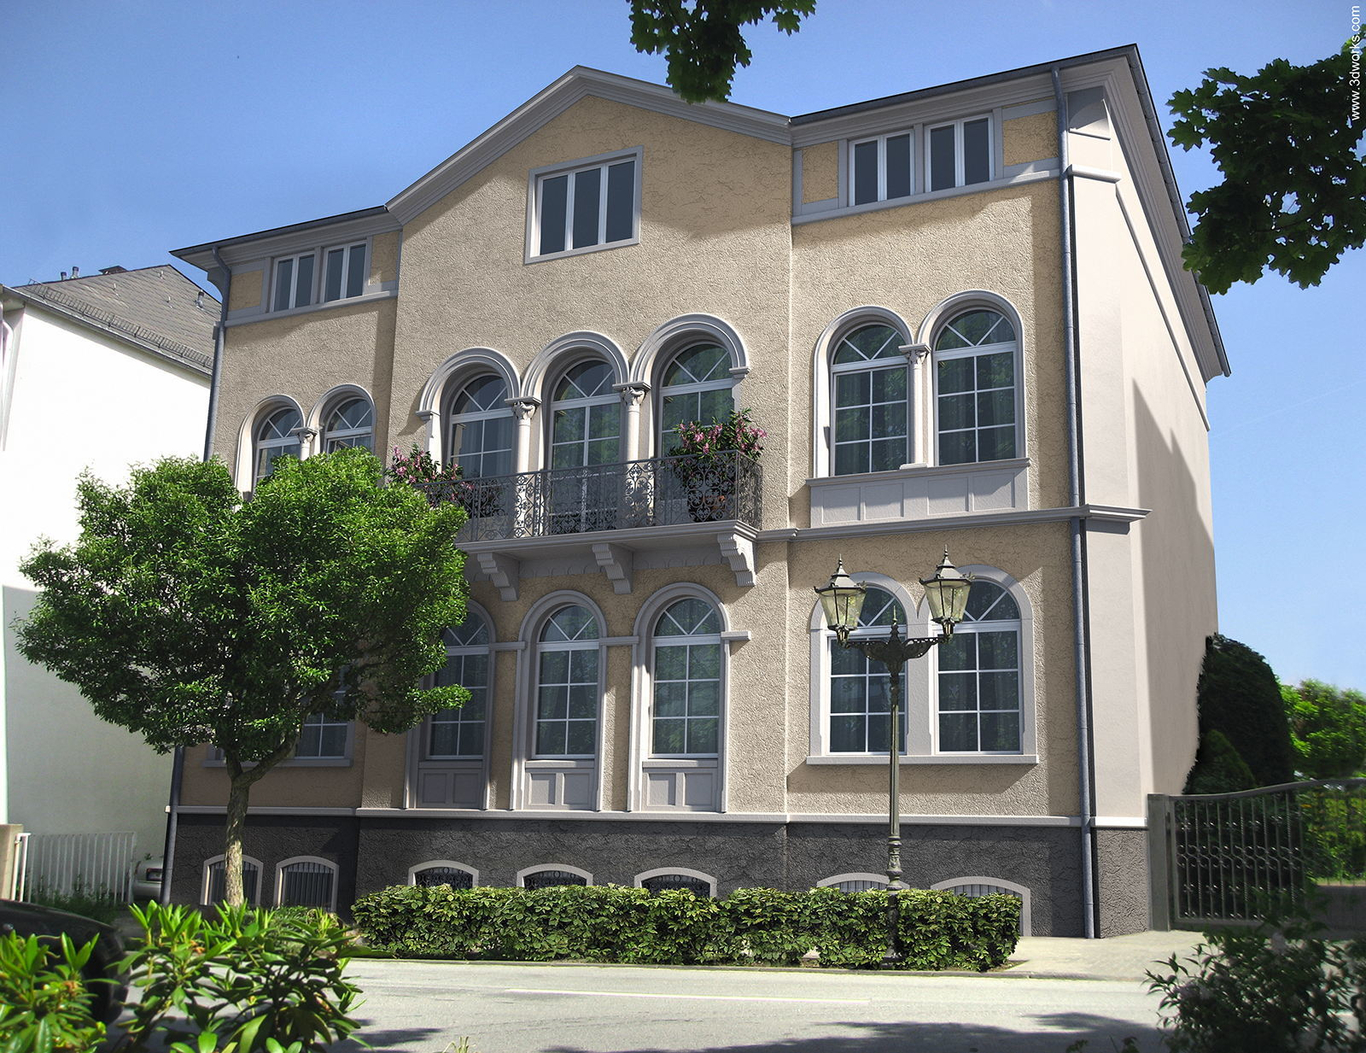 Threedeworks neo classical villa  1 75a896af m9ro